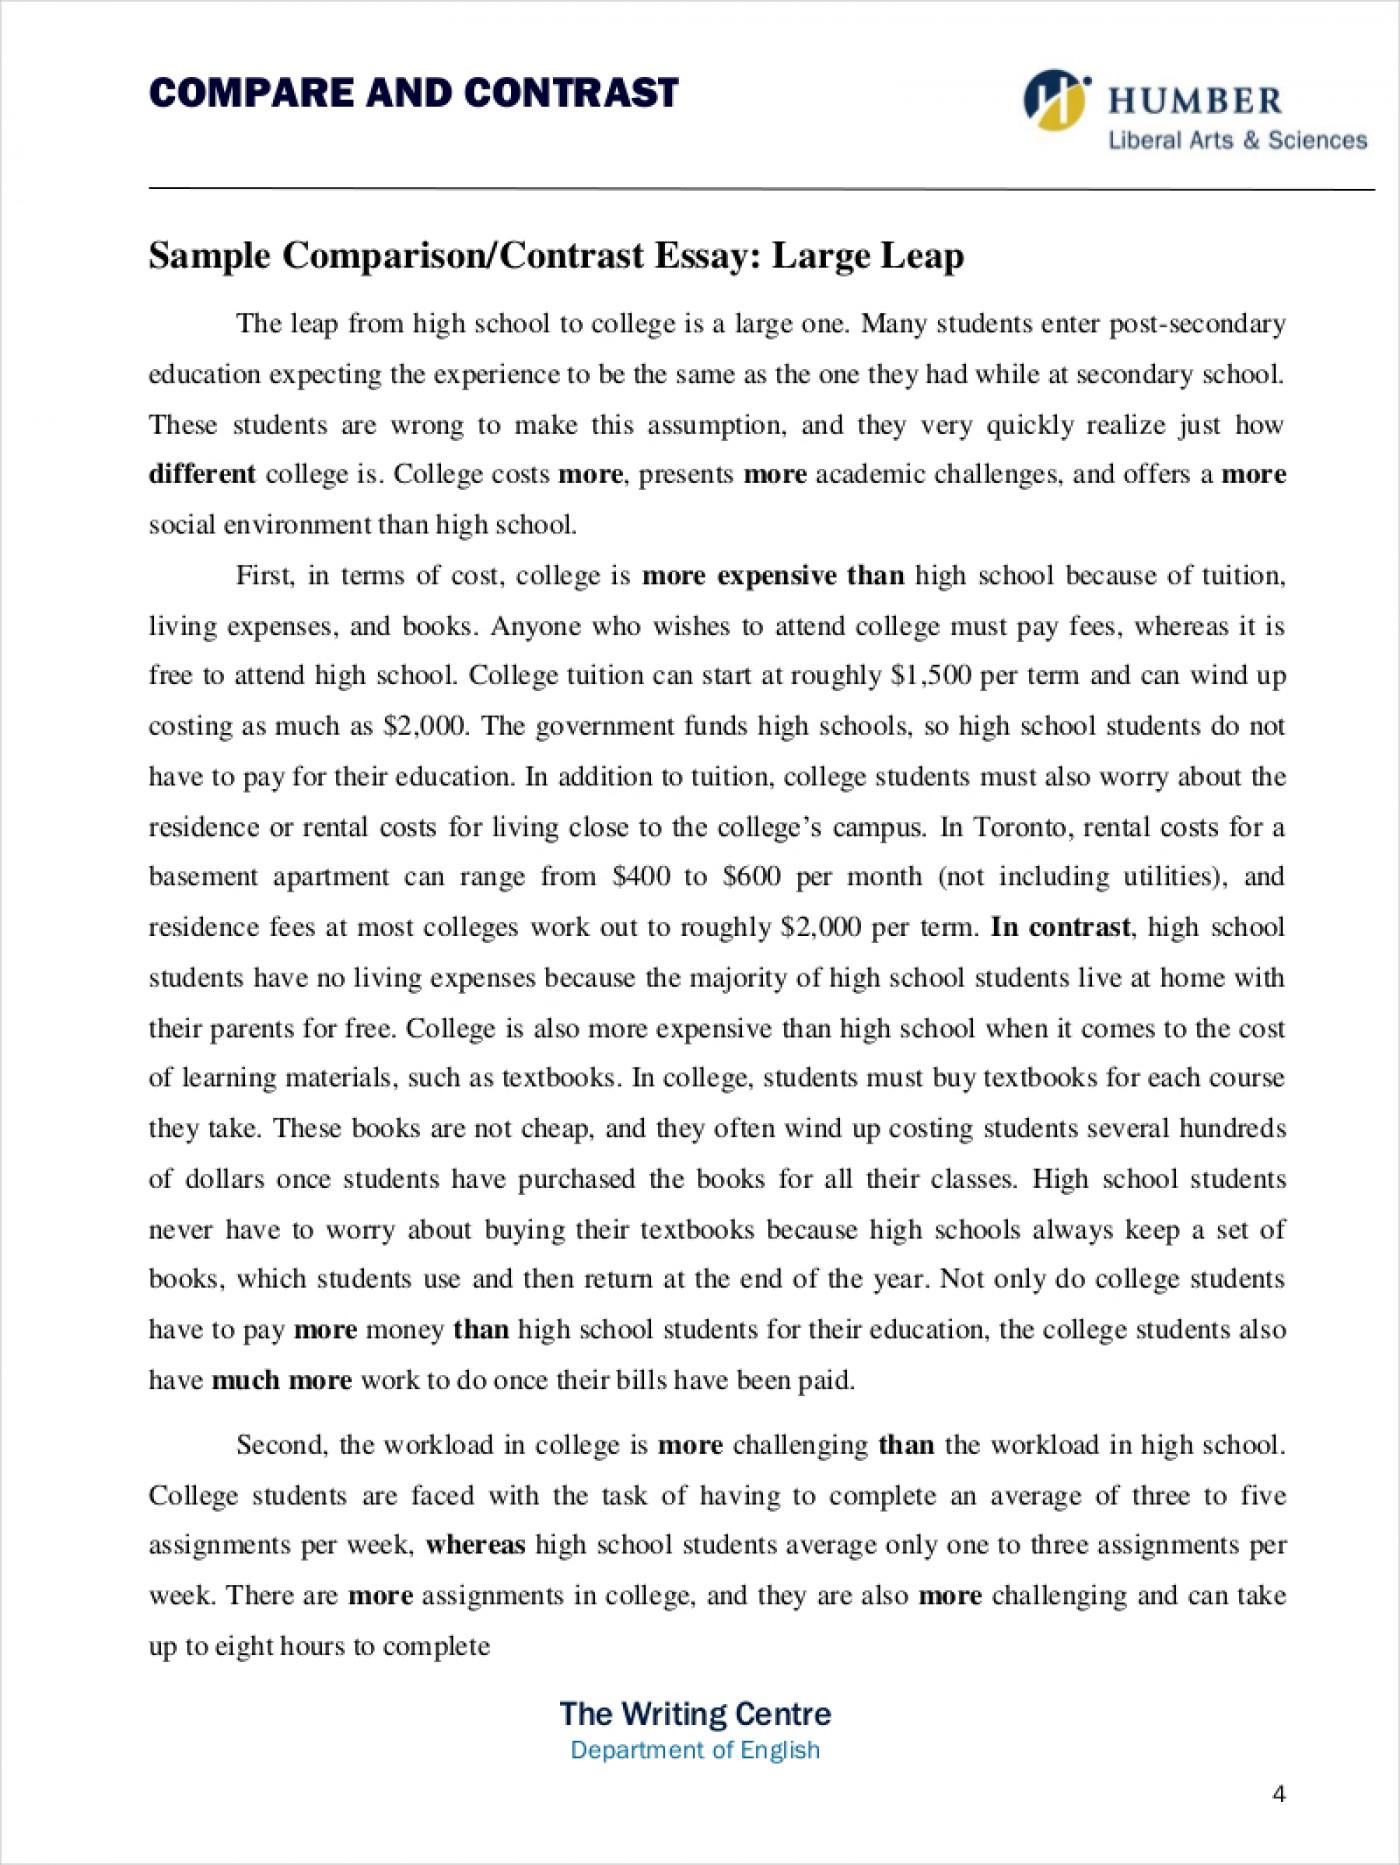 Prose analysis essay